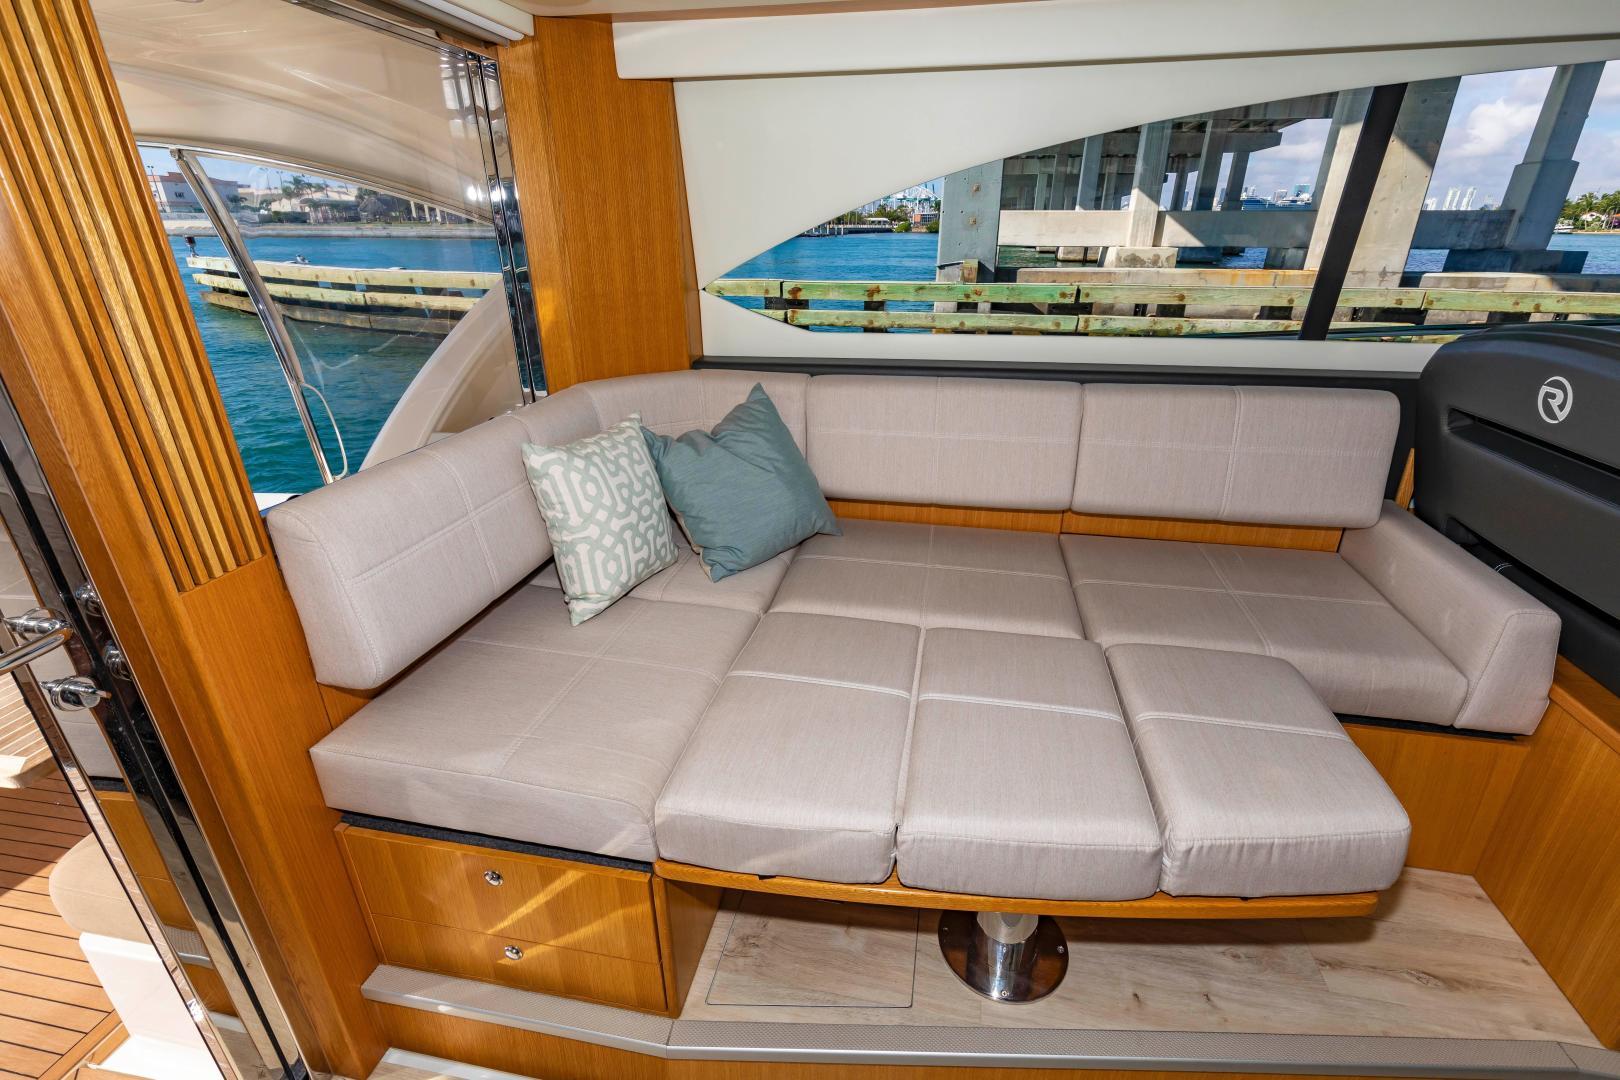 Riviera-395 SUV 2019-Ipanema Miami Beach-Florida-United States-1614902   Thumbnail